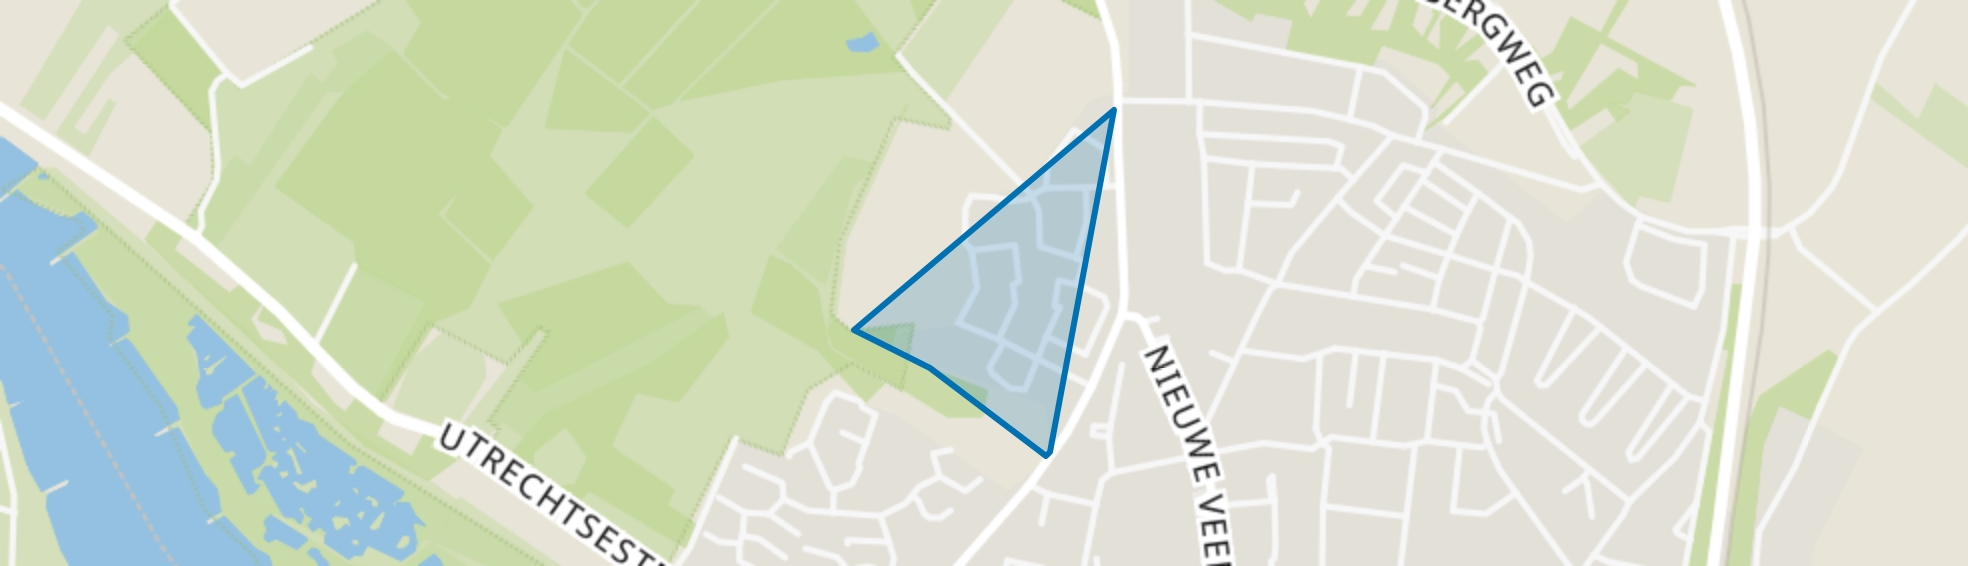 Koerheuvel, Rhenen map